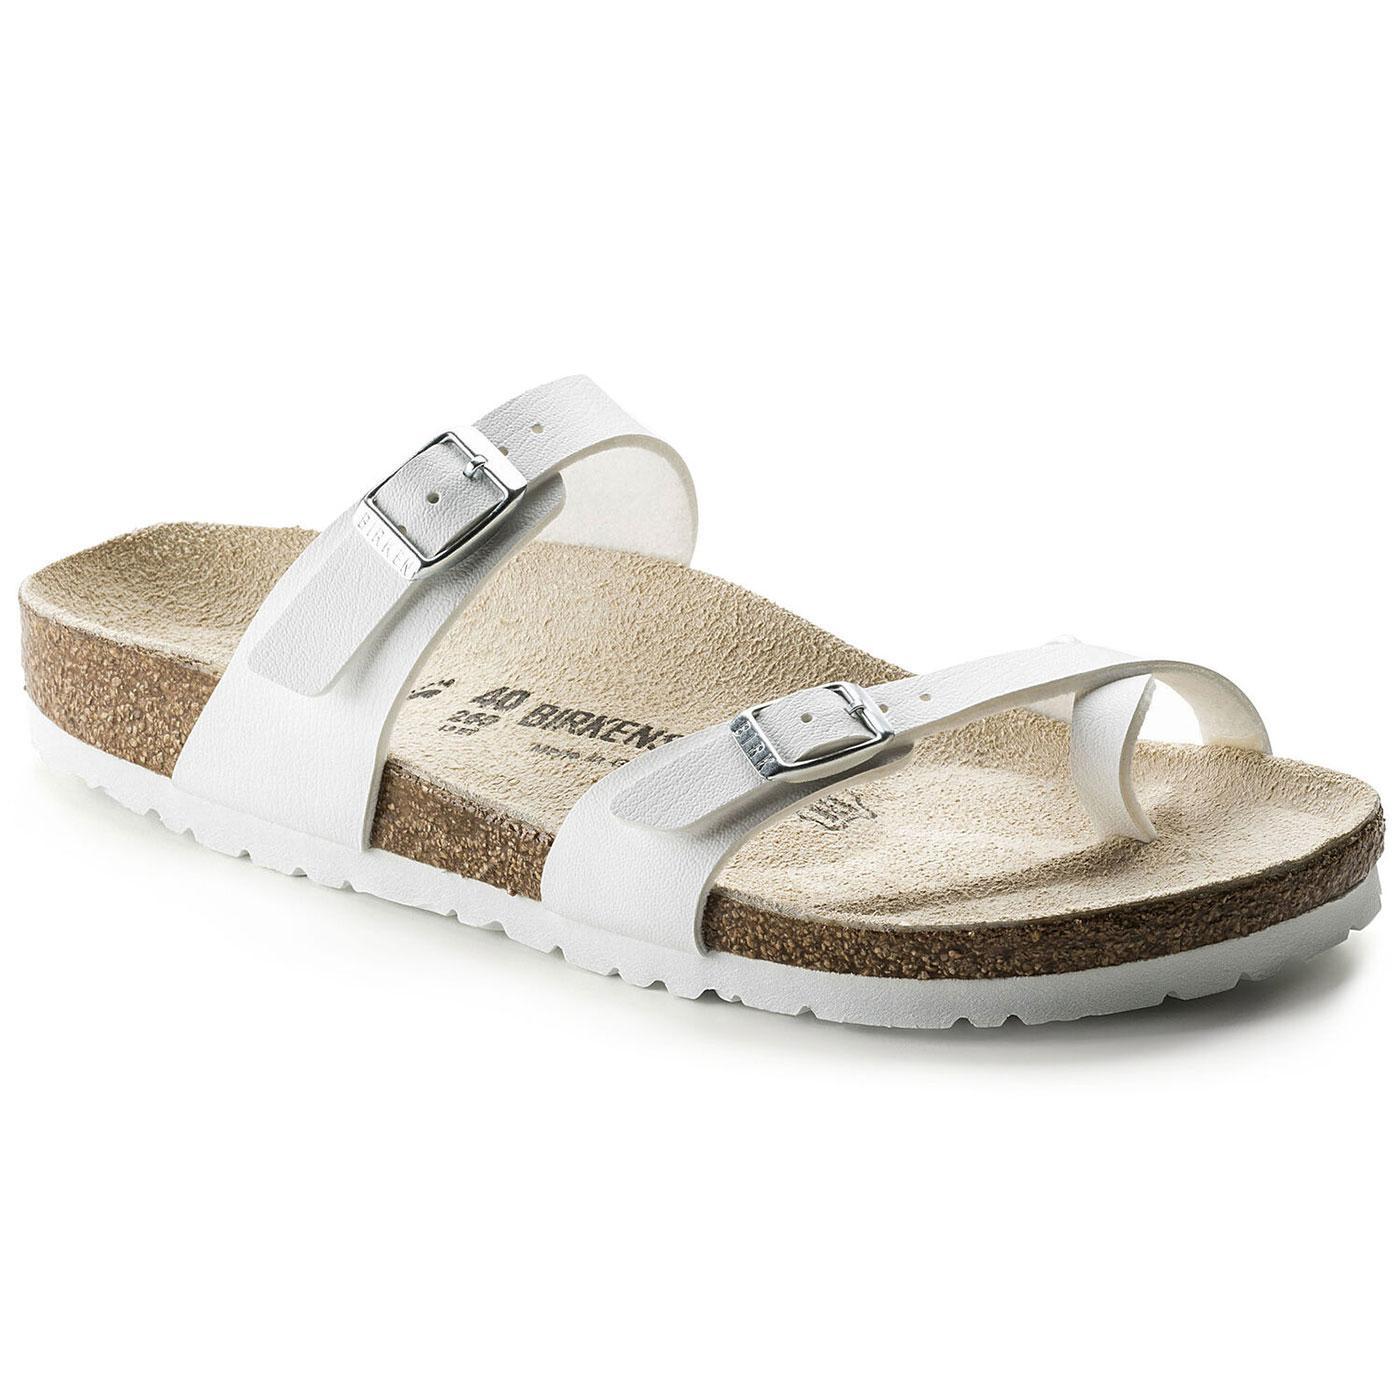 Mayari BIRKENSTOCK Women's BF Retro Sandals W